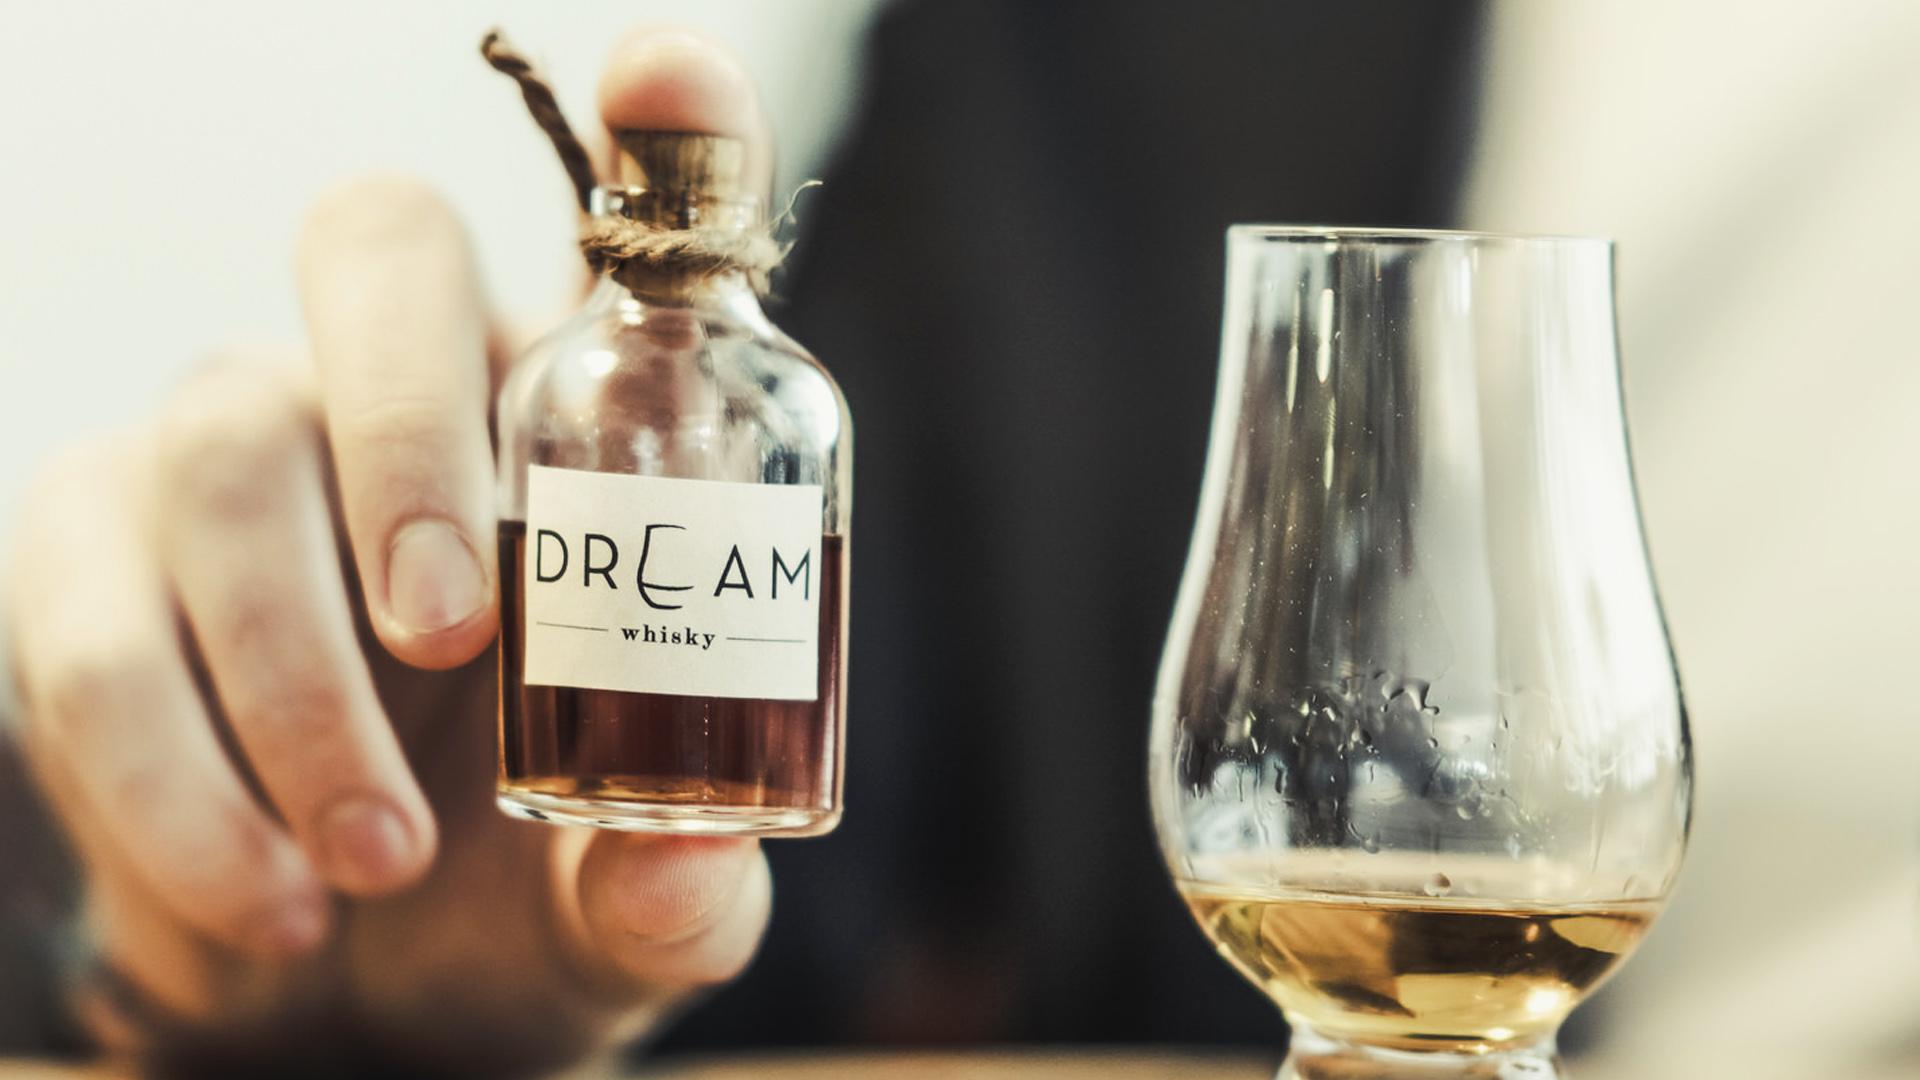 Whisky italiano: Dream Whisky porta la Scozia in Italia